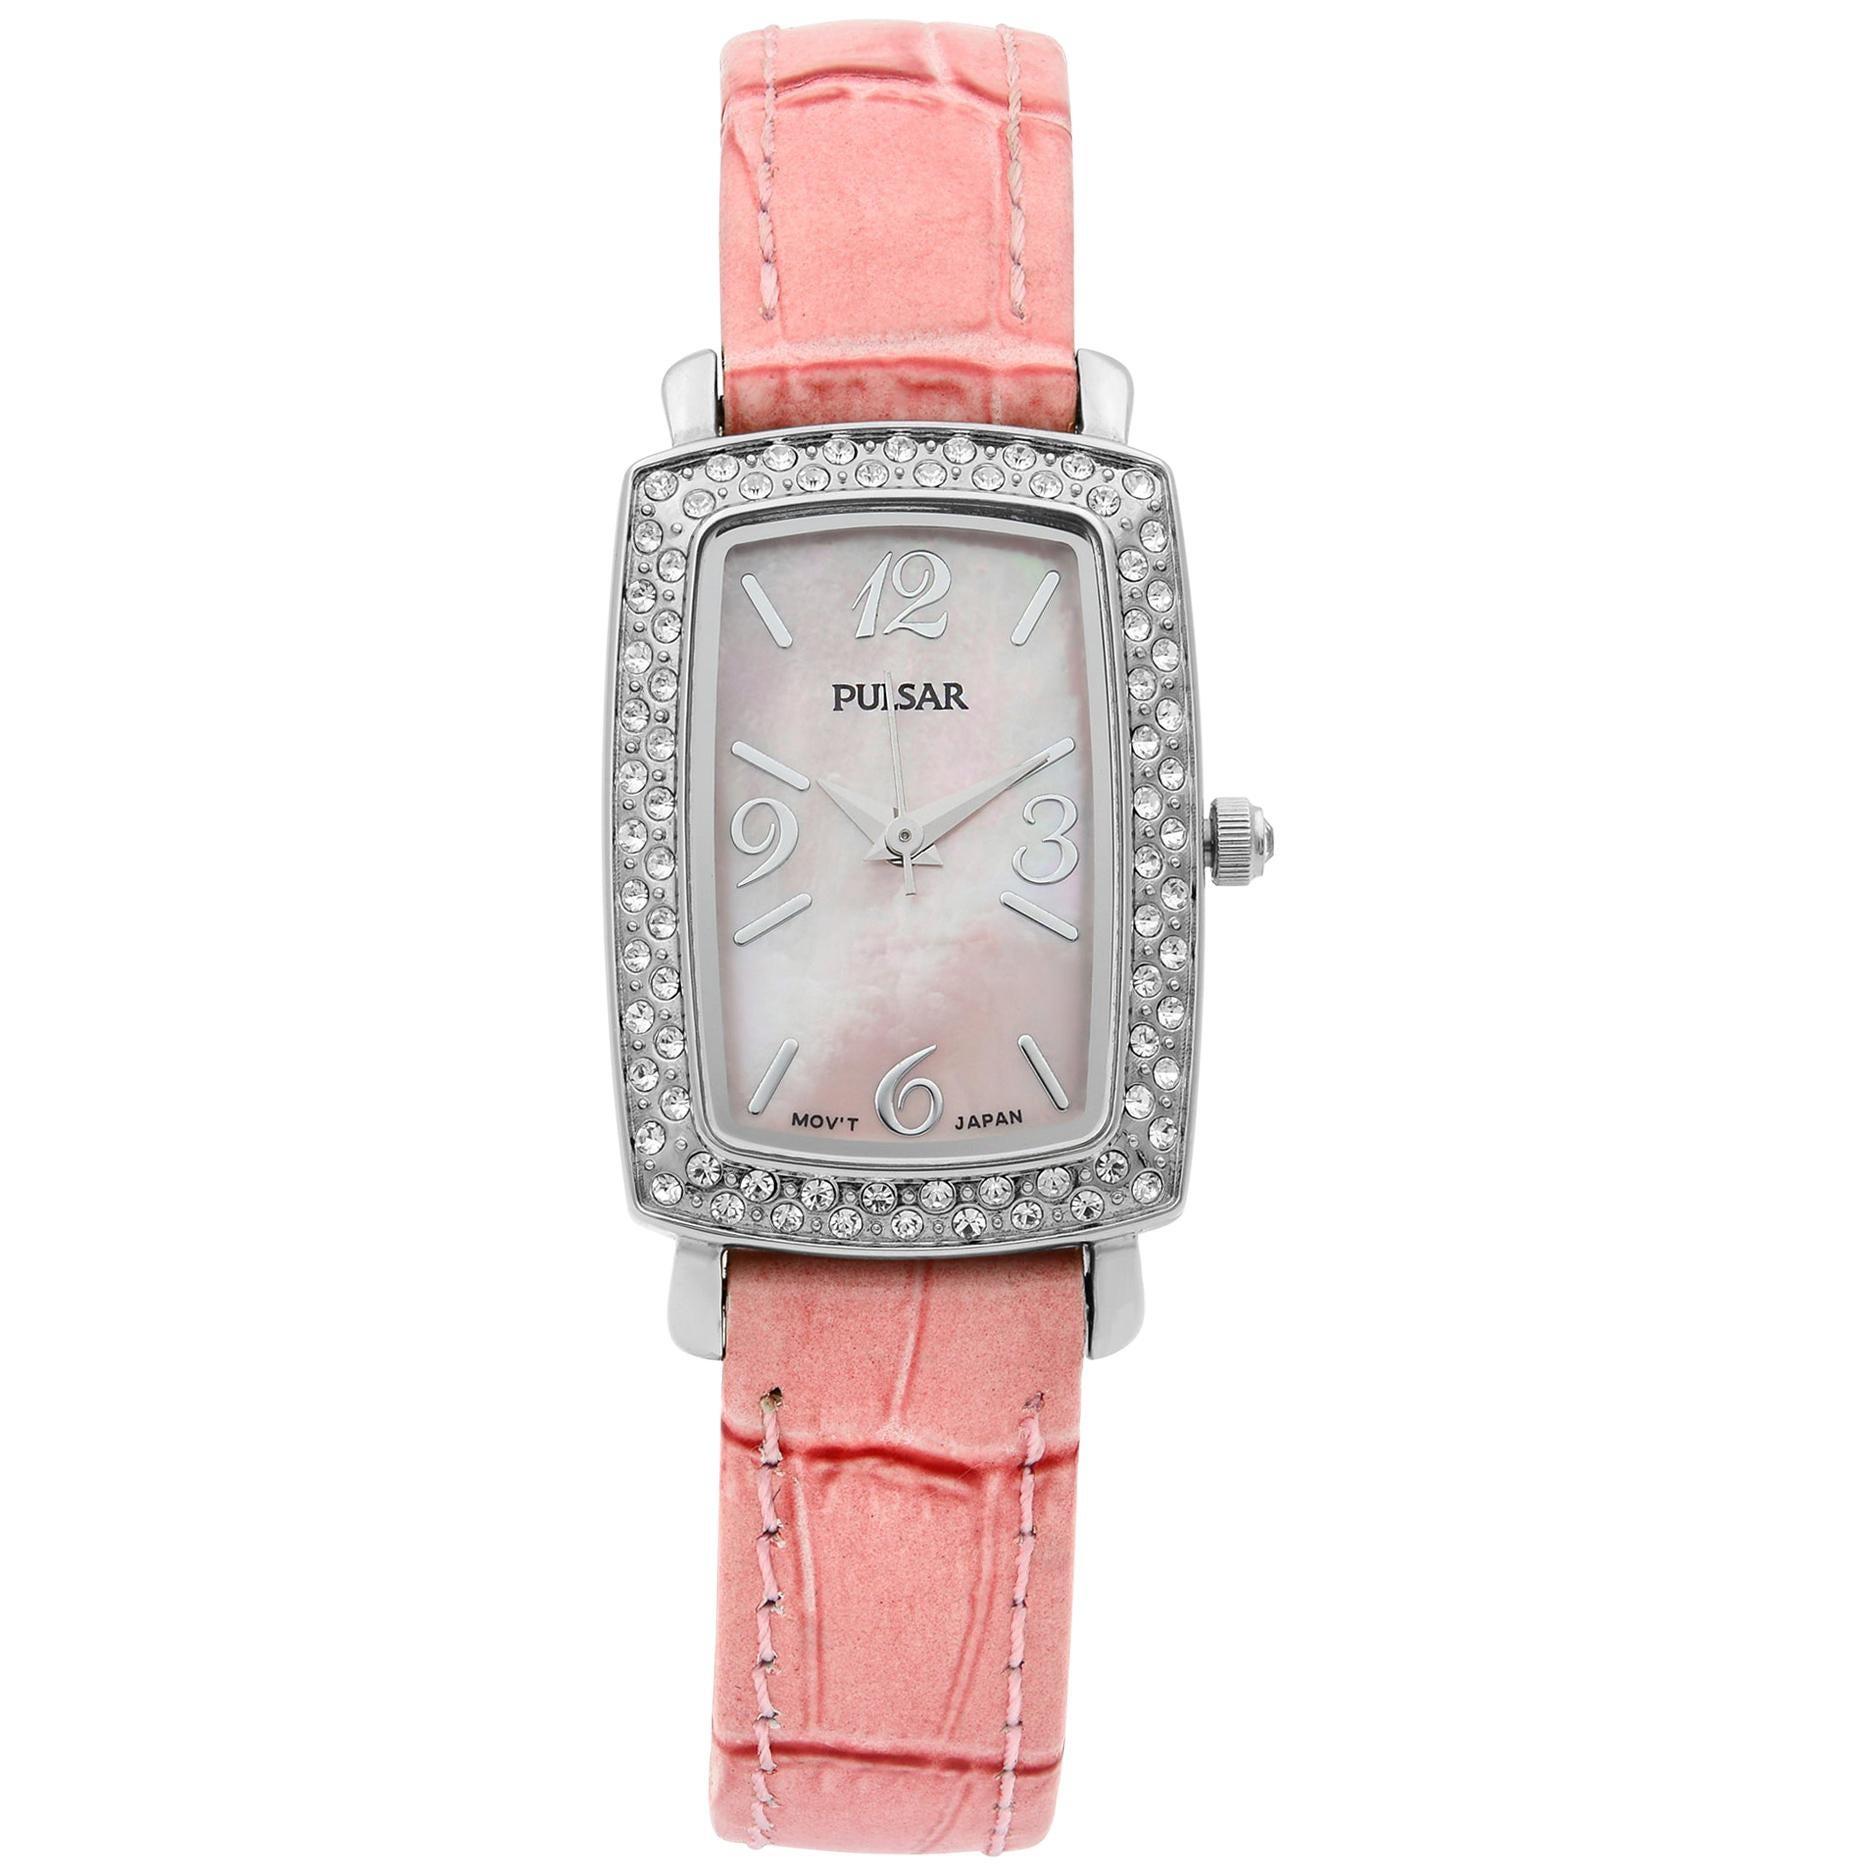 Pulsar Steel Pink Mother of Pearl Dial Quartz Ladies Watch PTC499